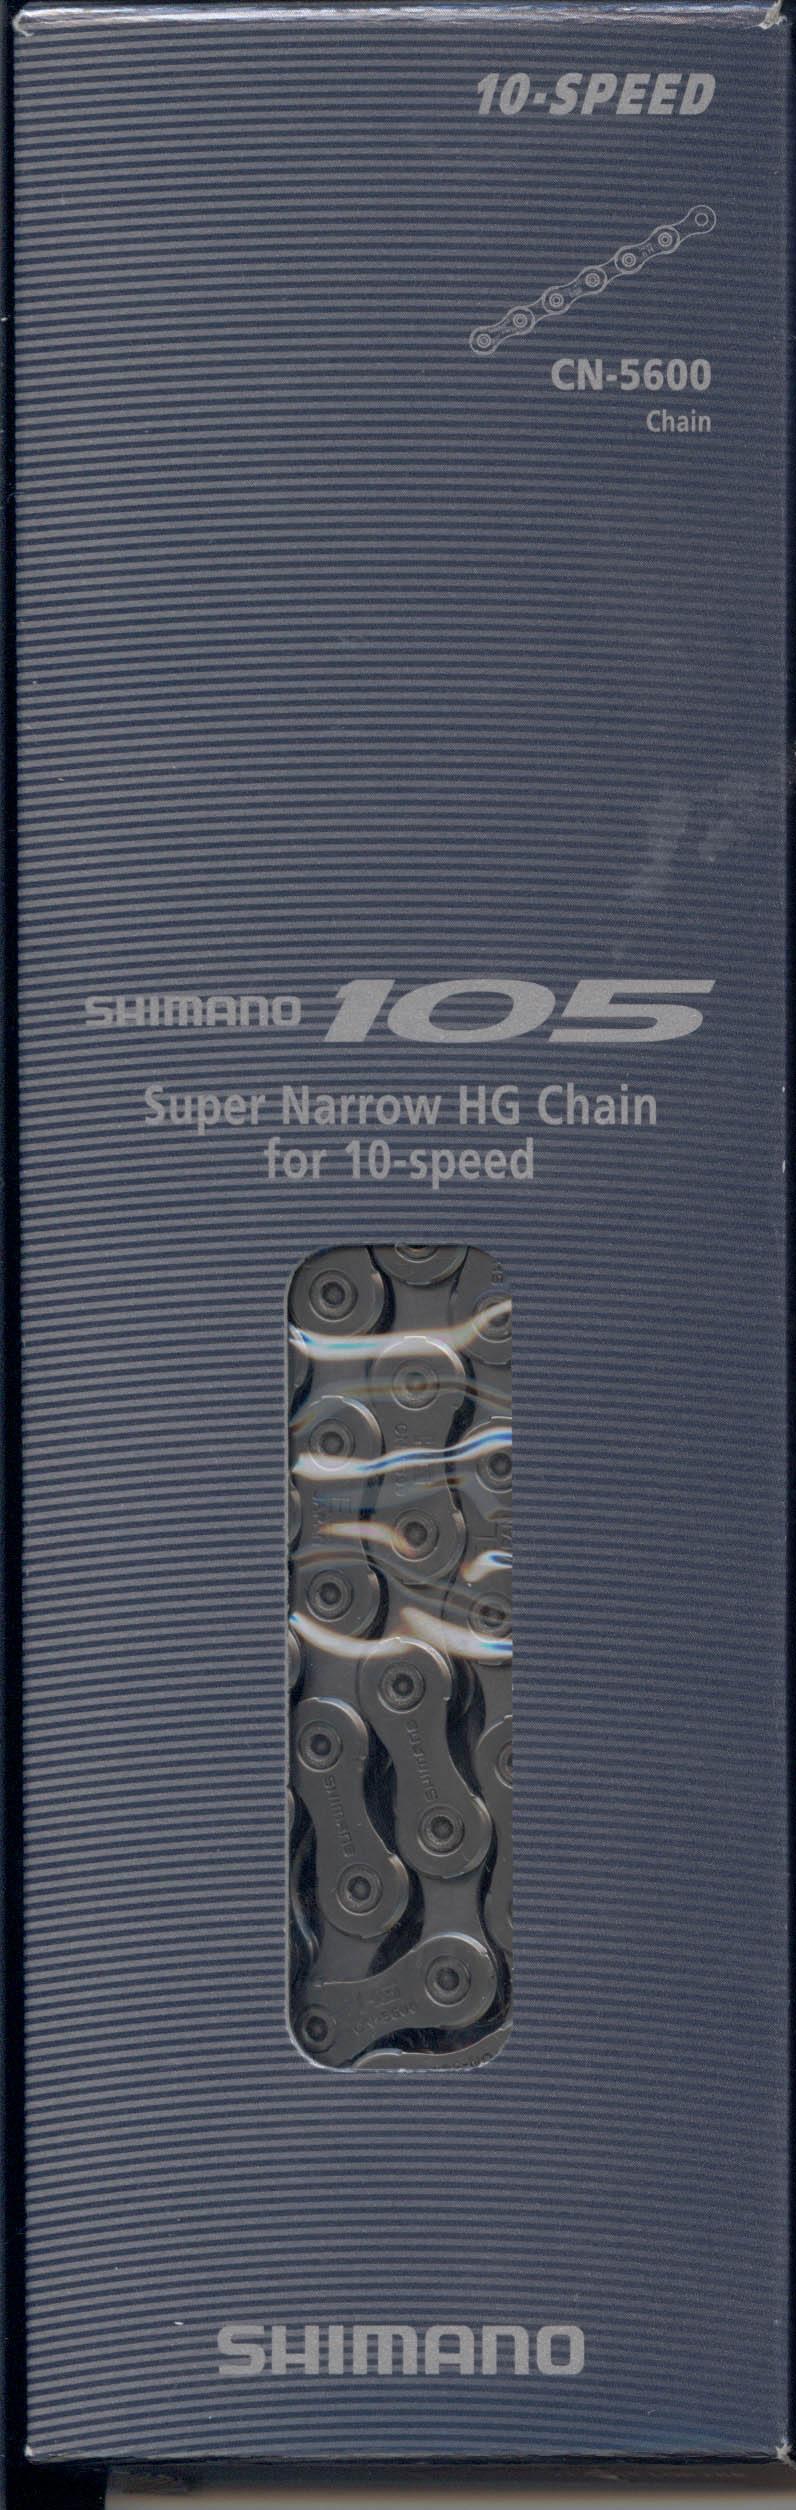 HG 105